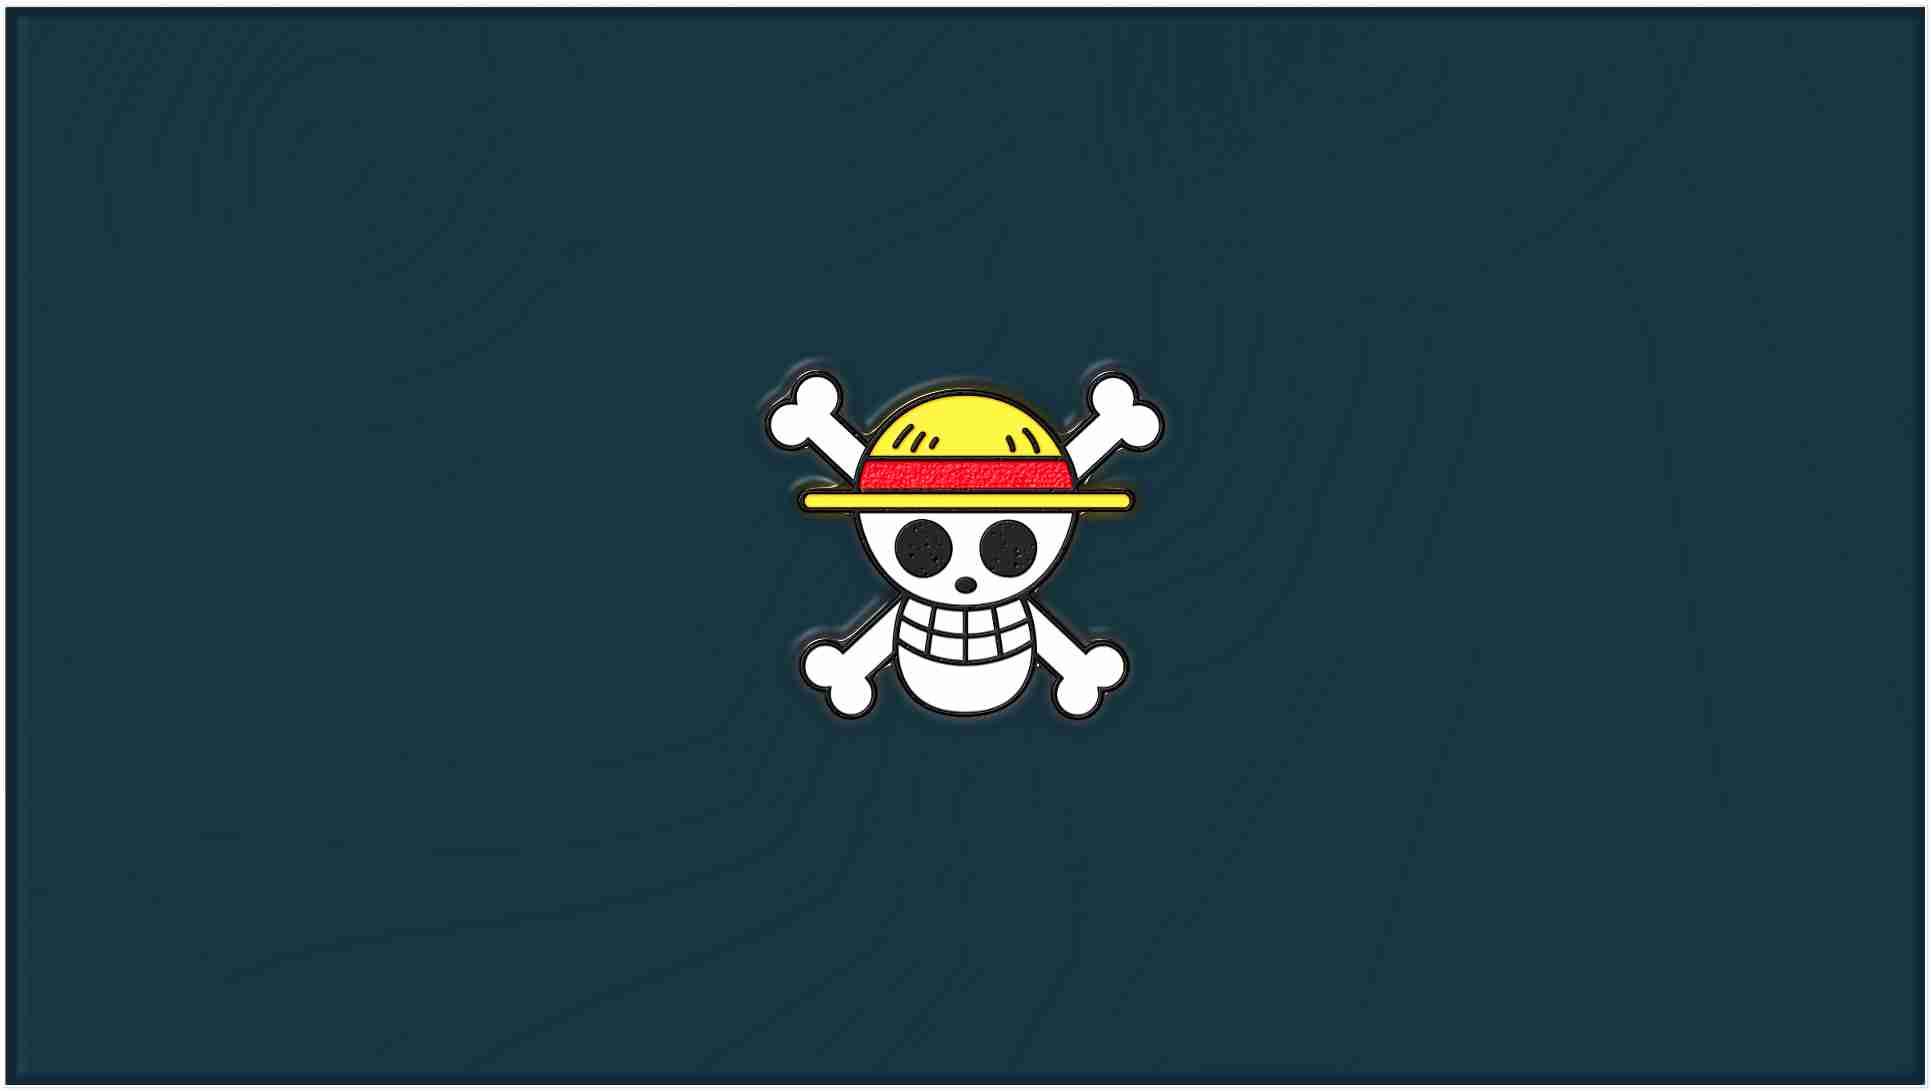 One Piece Logo Wallpaper 1080p Logo Wallpapers Hd One Piece Flag 1920x1080 Download Hd Wallpaper Wallpapertip